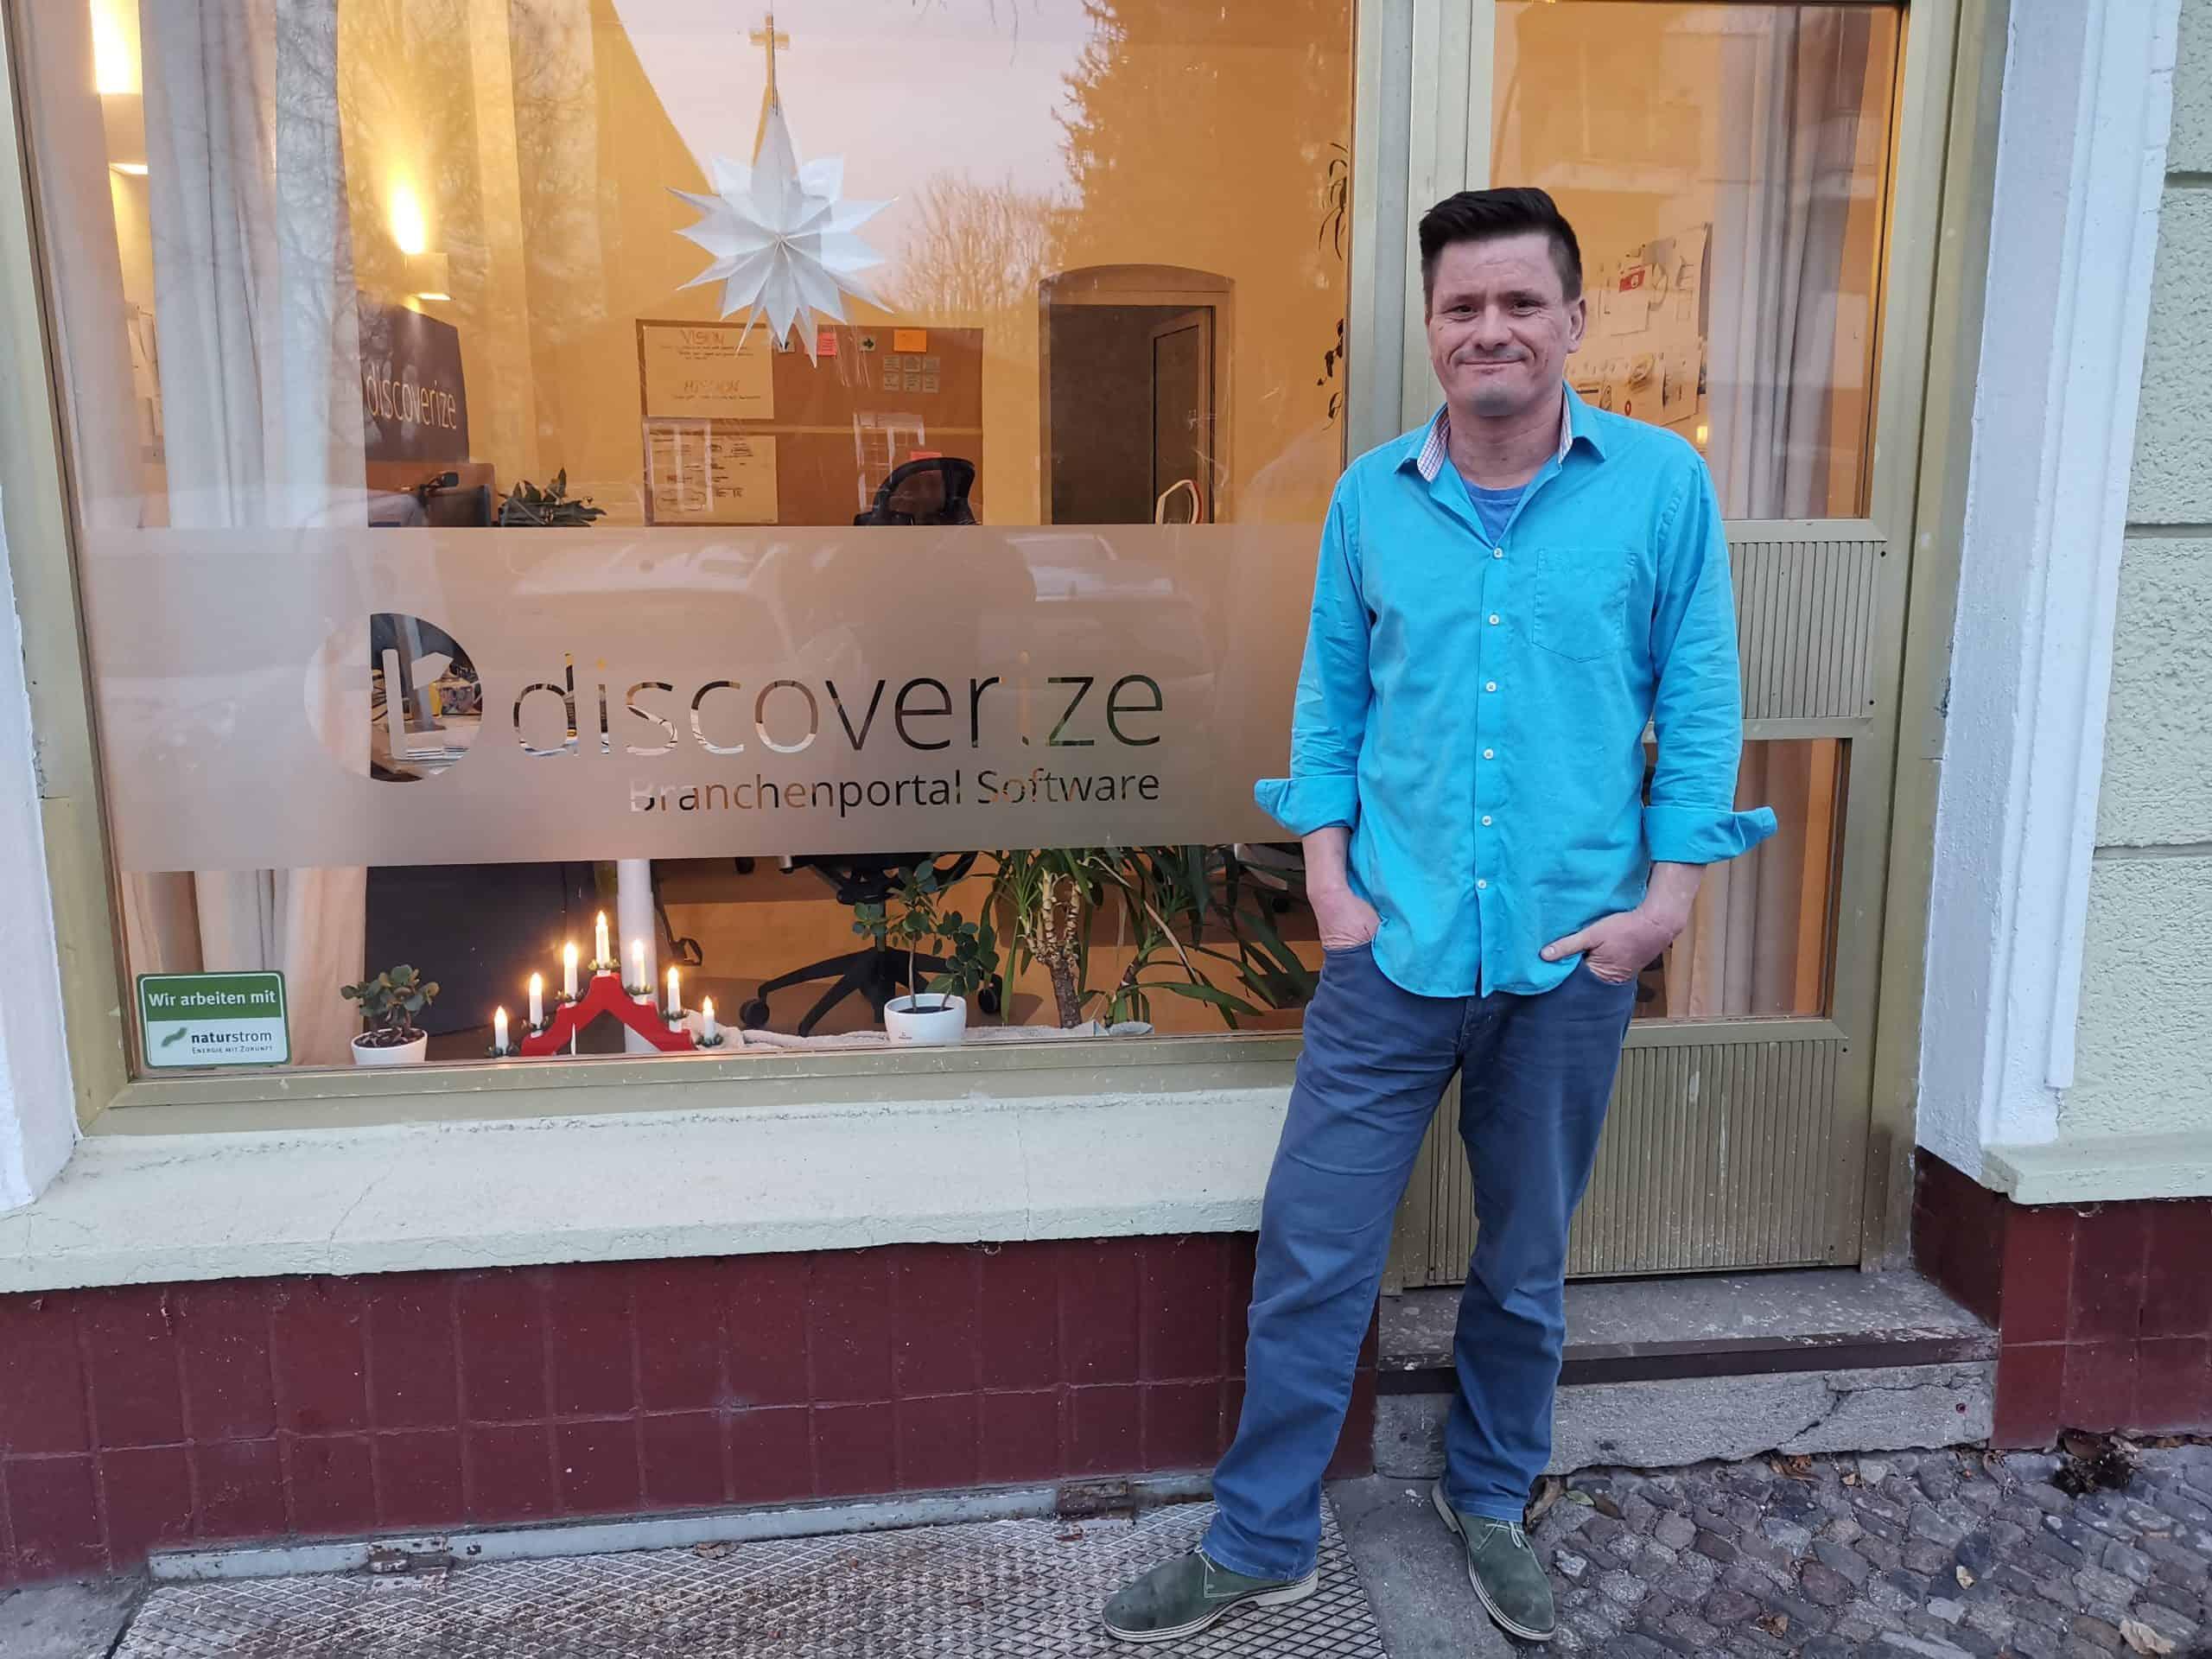 discoverize - Branchenportal Software - Büro - Andrej Telle